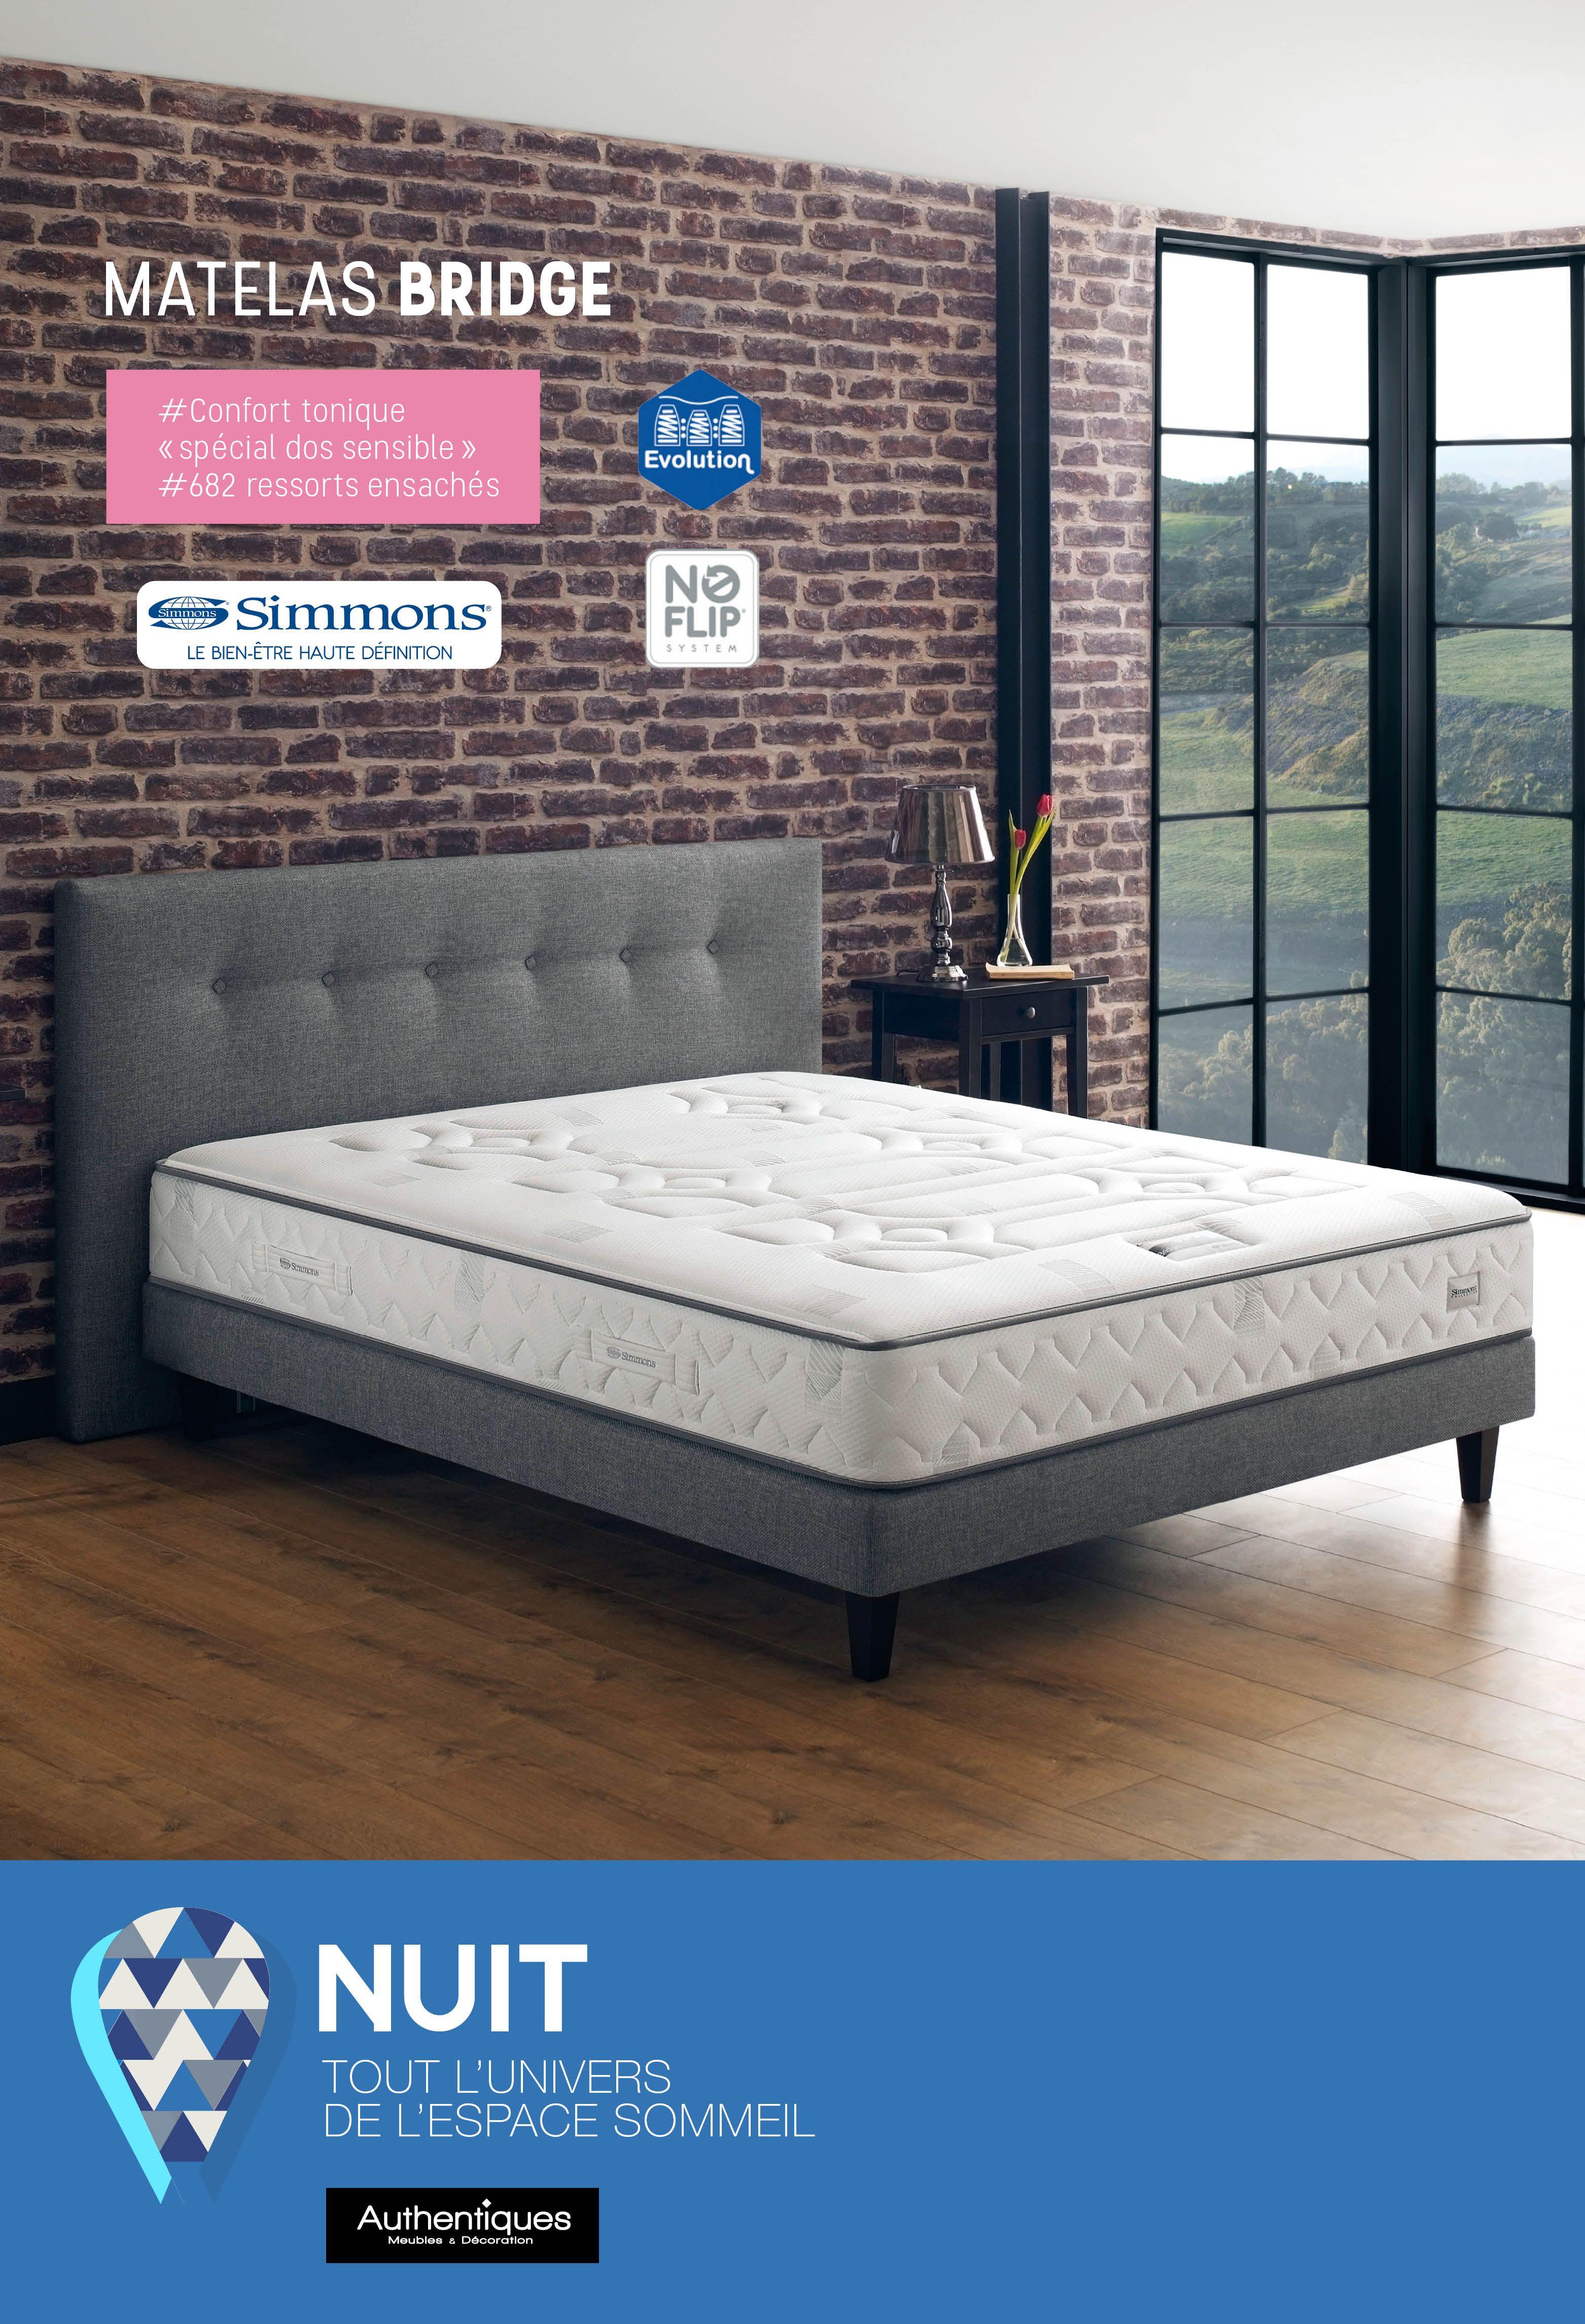 matelas extra ferme affordable matelas bridge confort tonique soutien extra ferme special dos. Black Bedroom Furniture Sets. Home Design Ideas